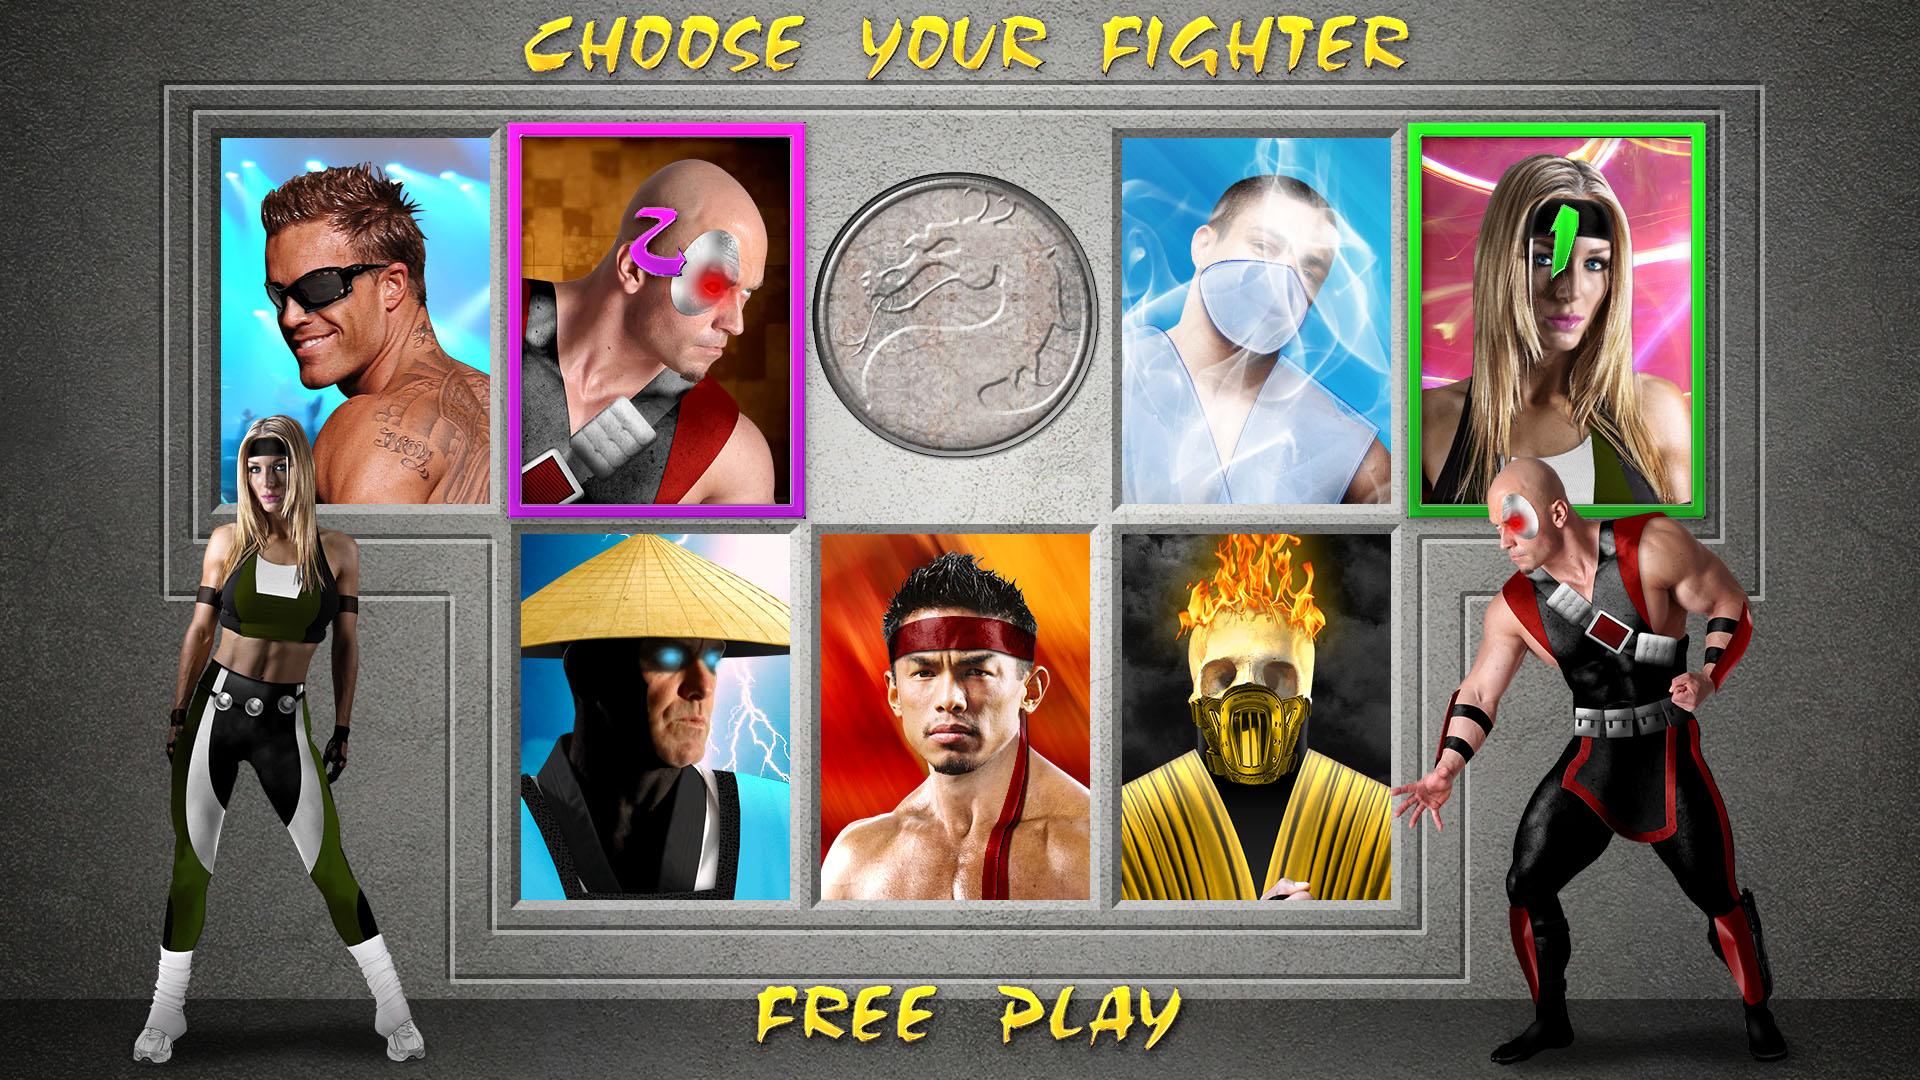 Mortal Kombat Raiden Drawings MK1 - Selection Screen...